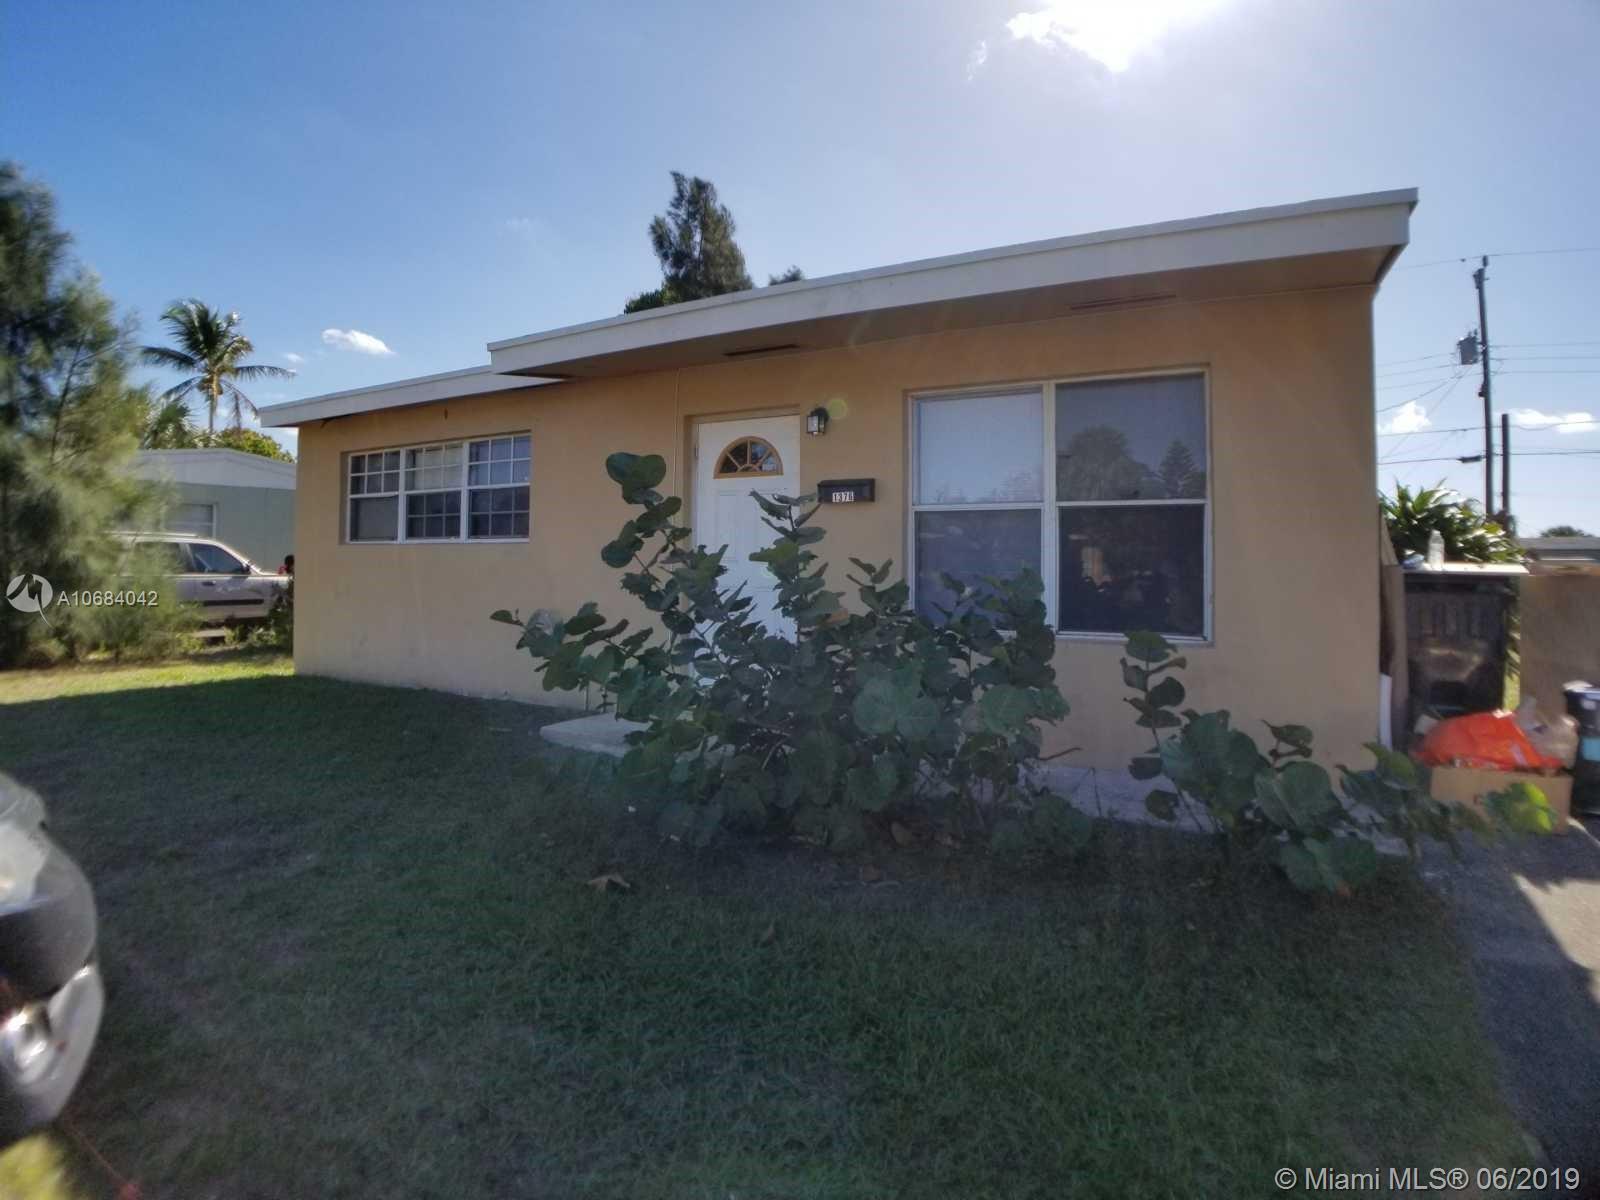 1376 11th St, West Palm Beach, FL 33401